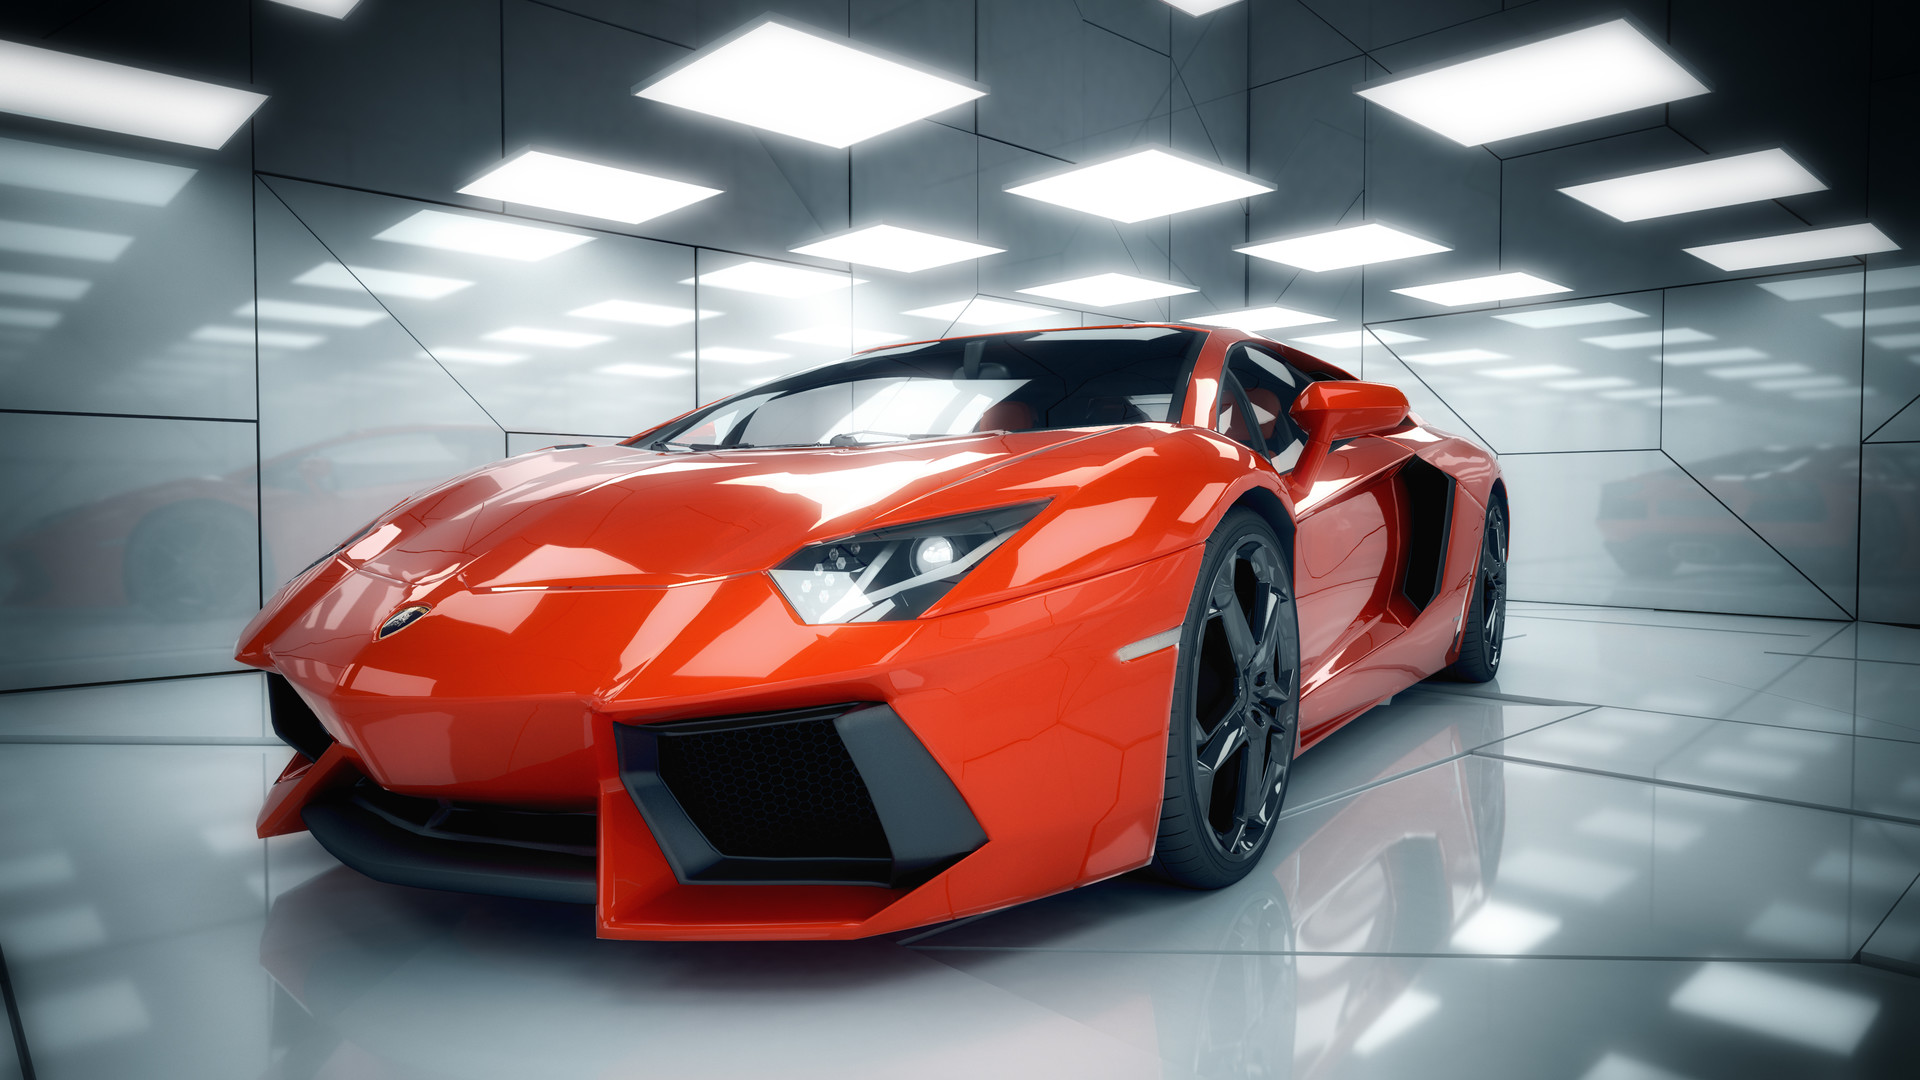 Mathias West Lamborghini Aventador And Bugatti Veyron